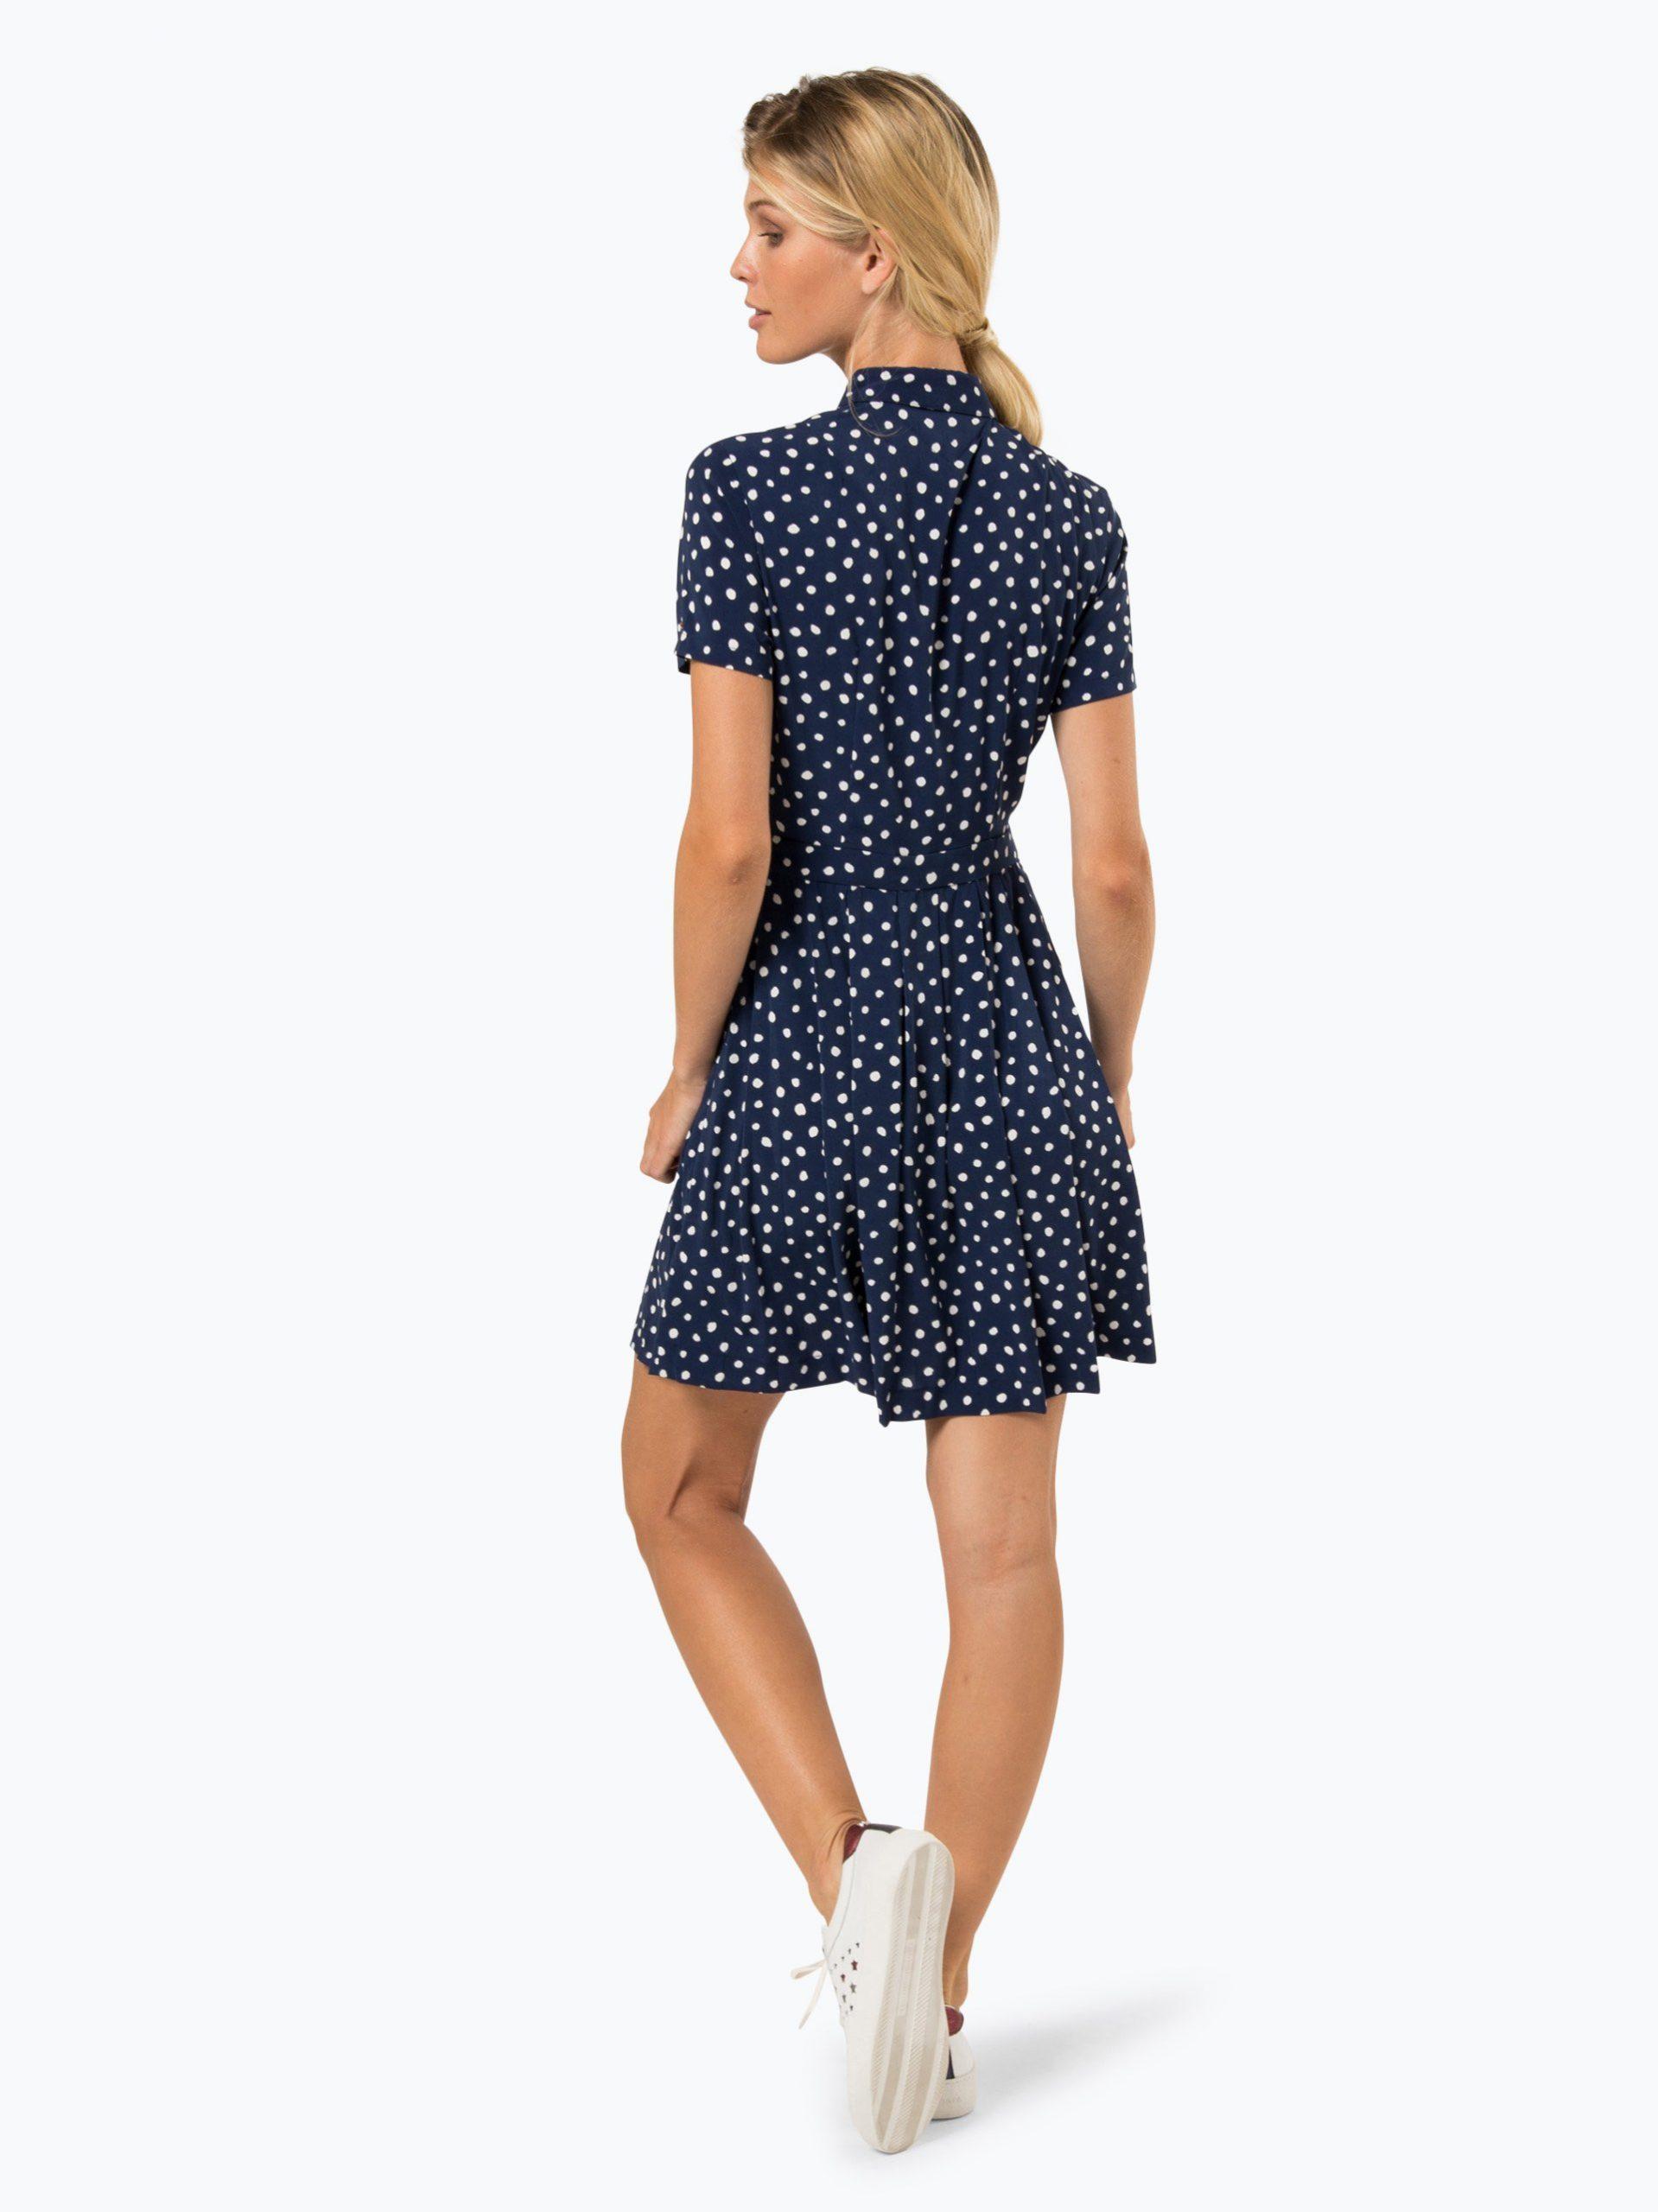 Tommy Jeans Damen Kleid Online Kaufen  Vangraaf